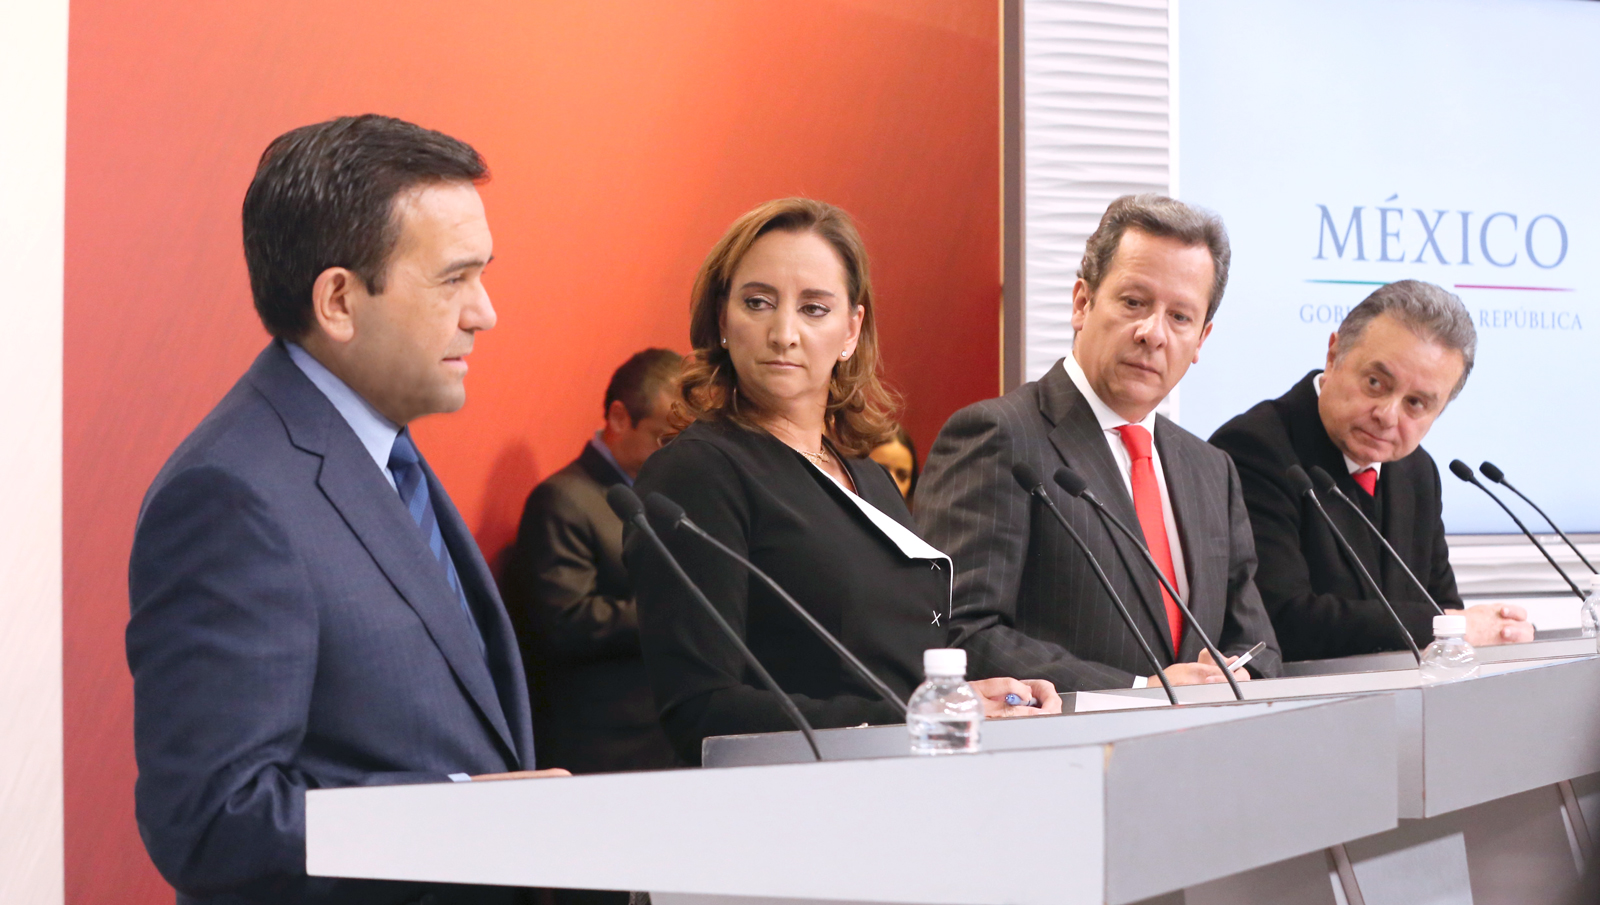 President Enrique Peña Nieto will visit the Arabian Peninsula